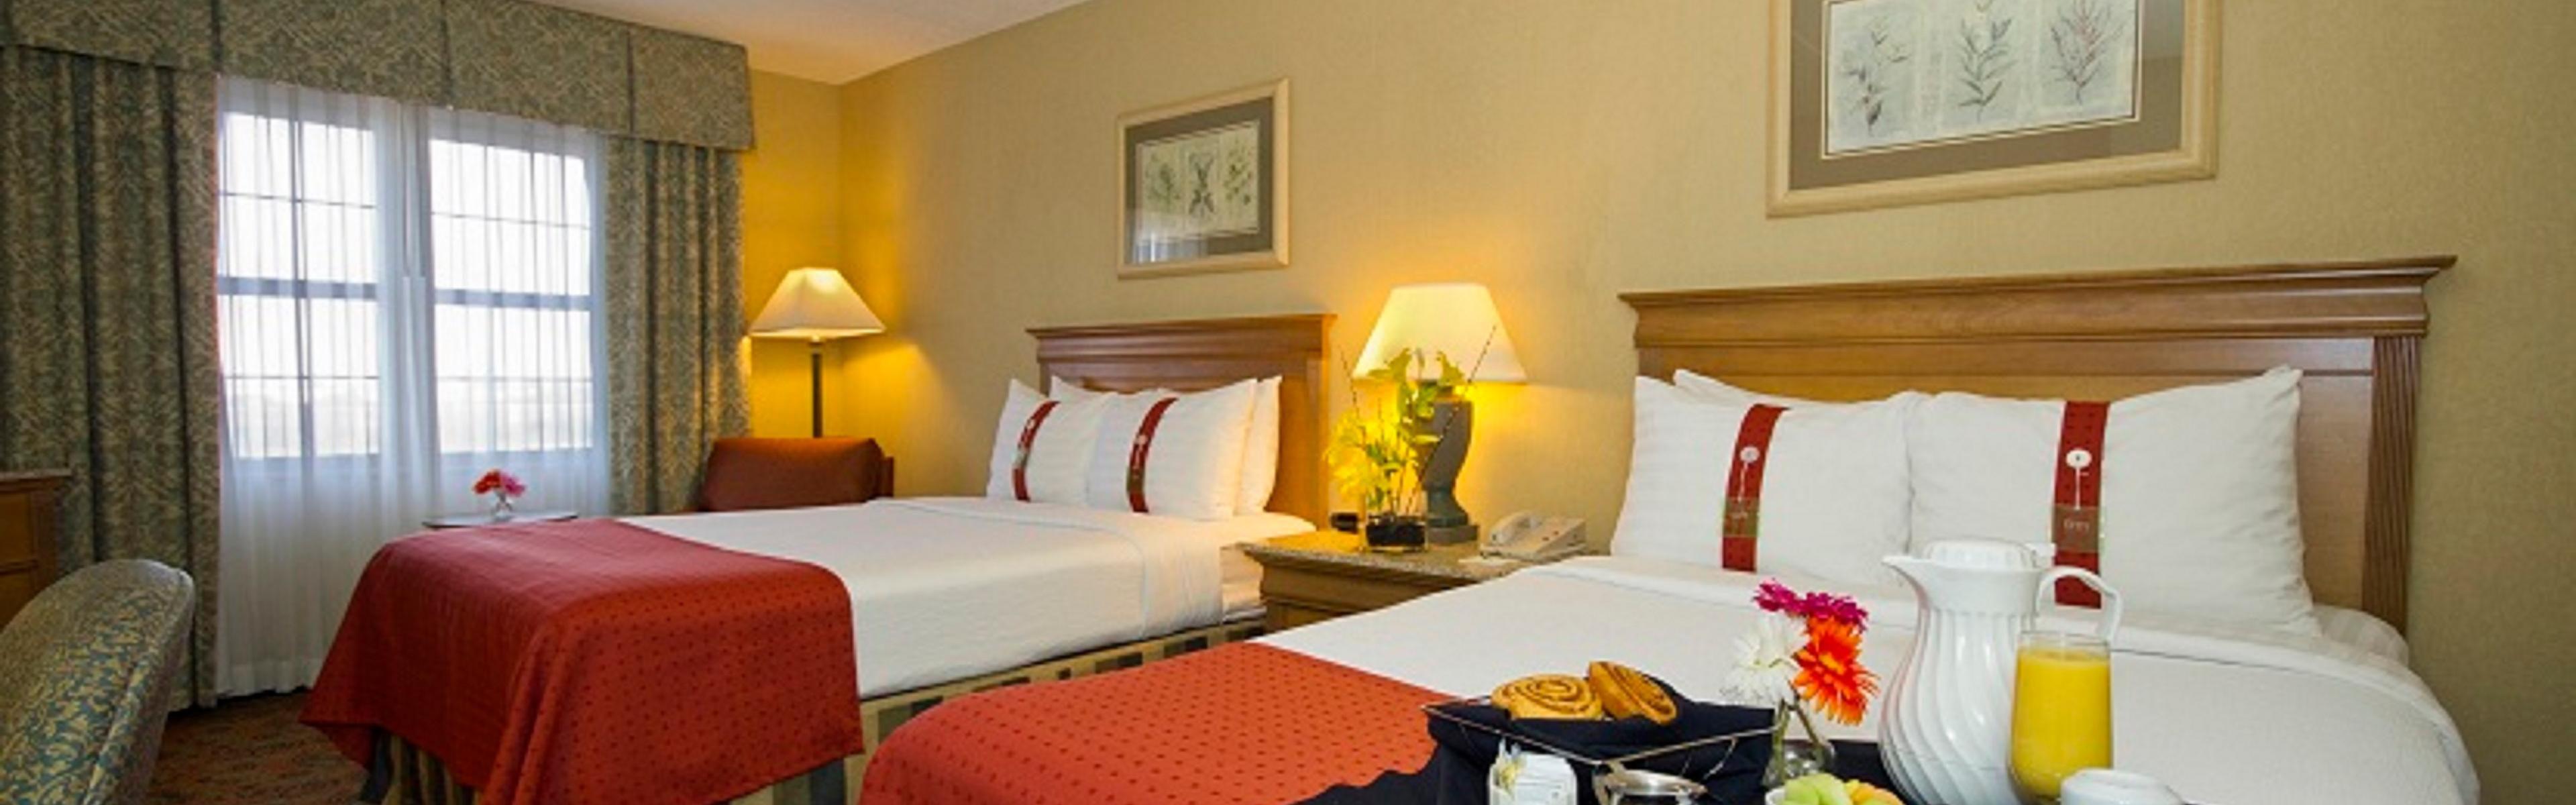 Holiday Inn Chicago-Tinley Park-Conv Ctr image 1